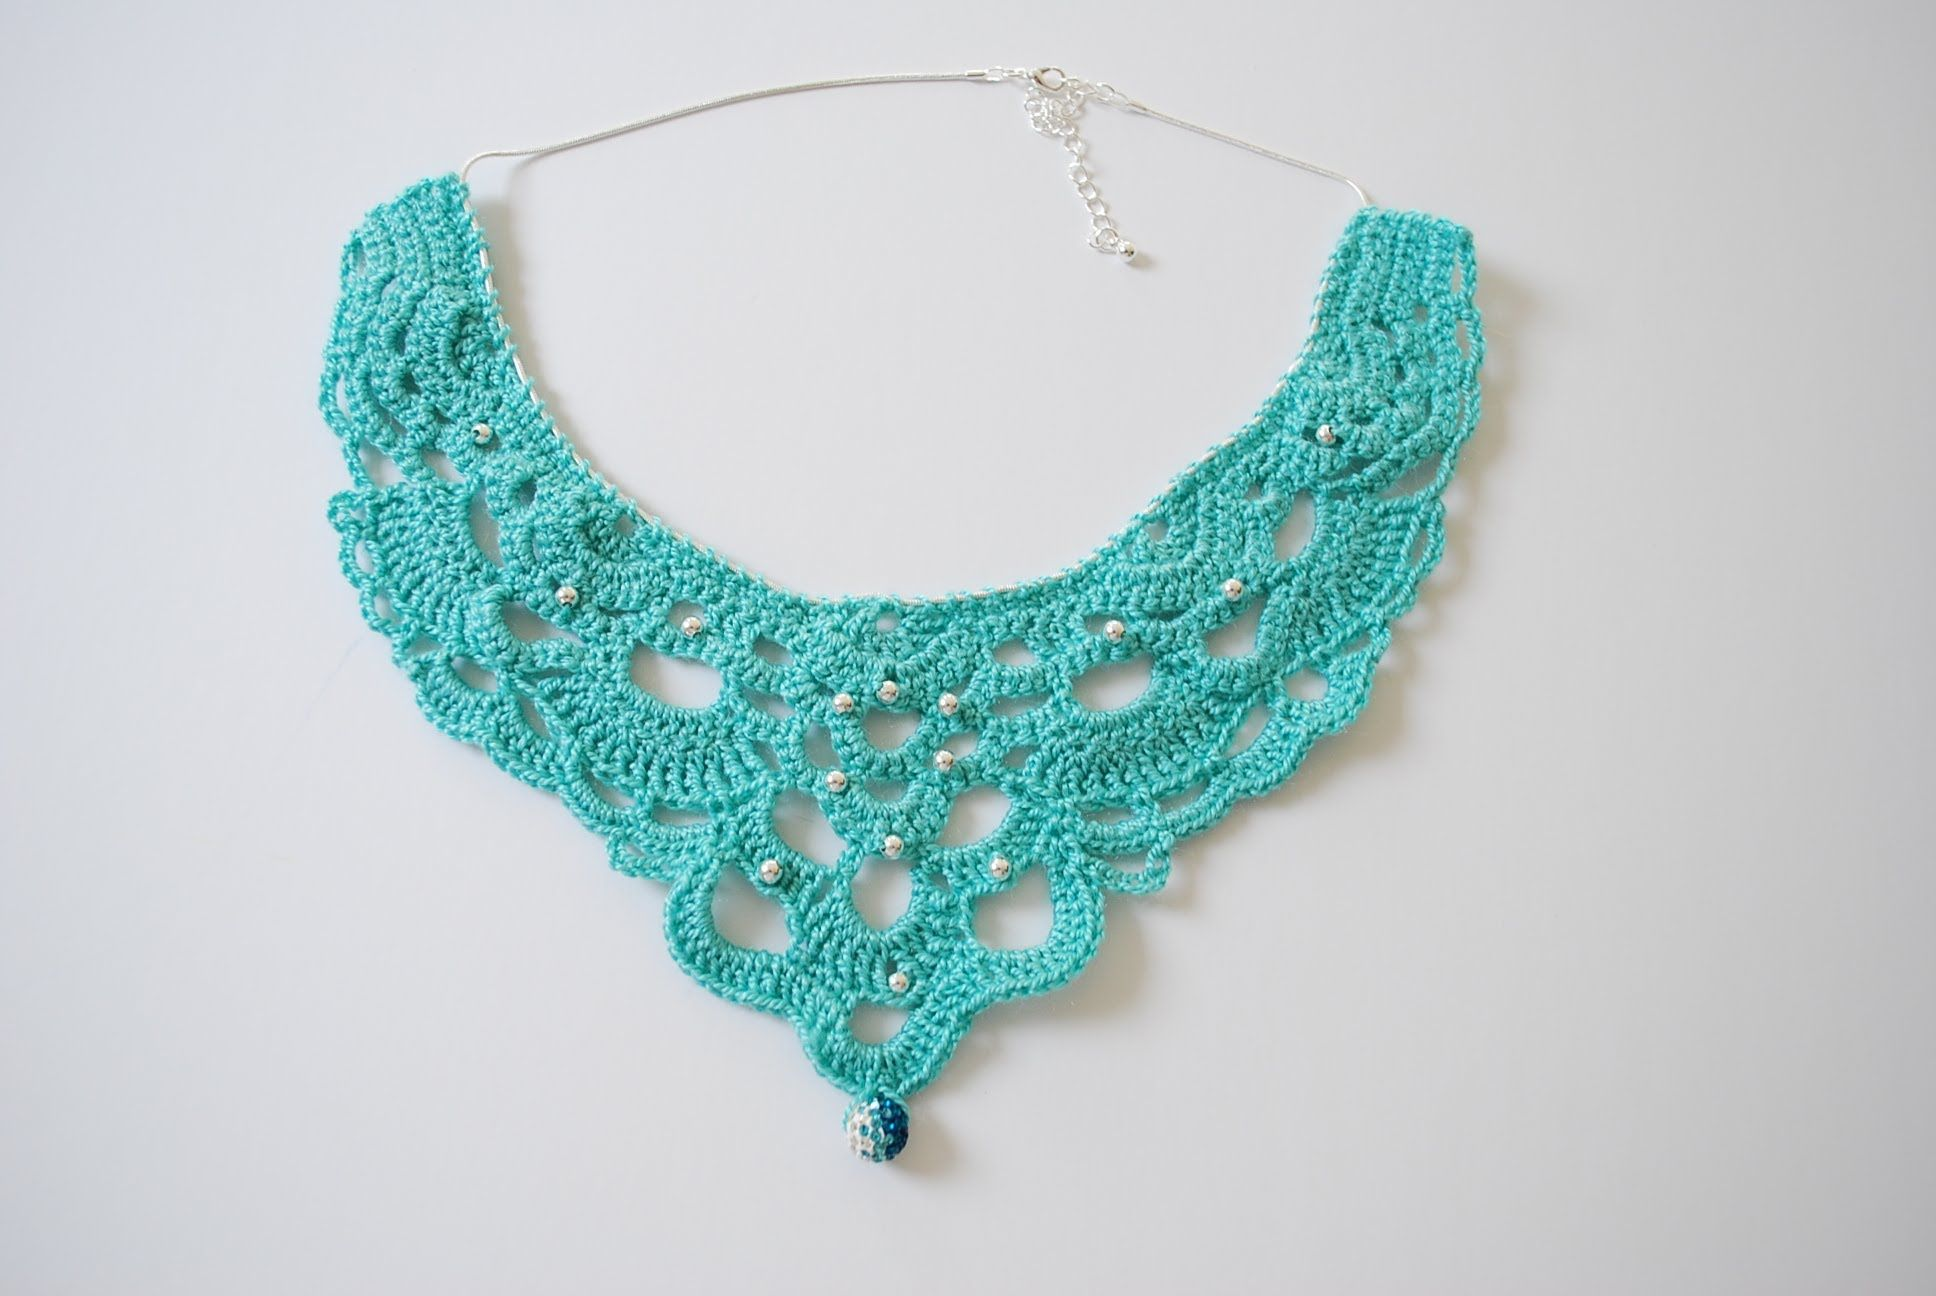 crochet necklace - Cerca con Google | Crochet | Pinterest | Google ...